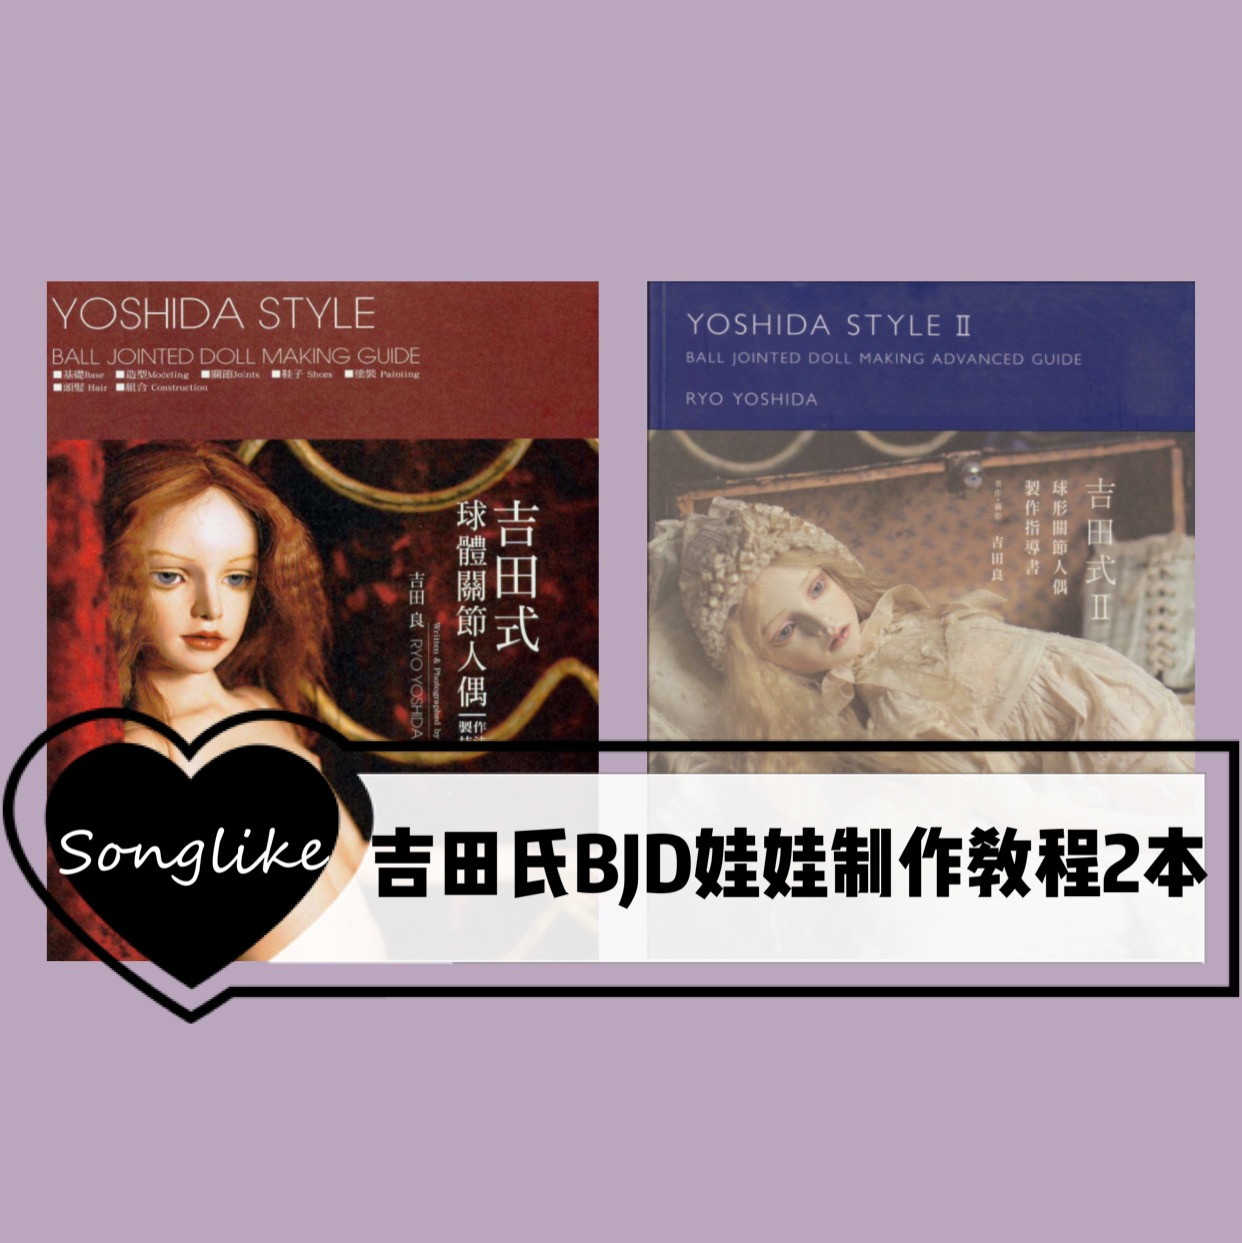 【Songlike】吉田式BJD娃娃中文制作教程书2本汇总